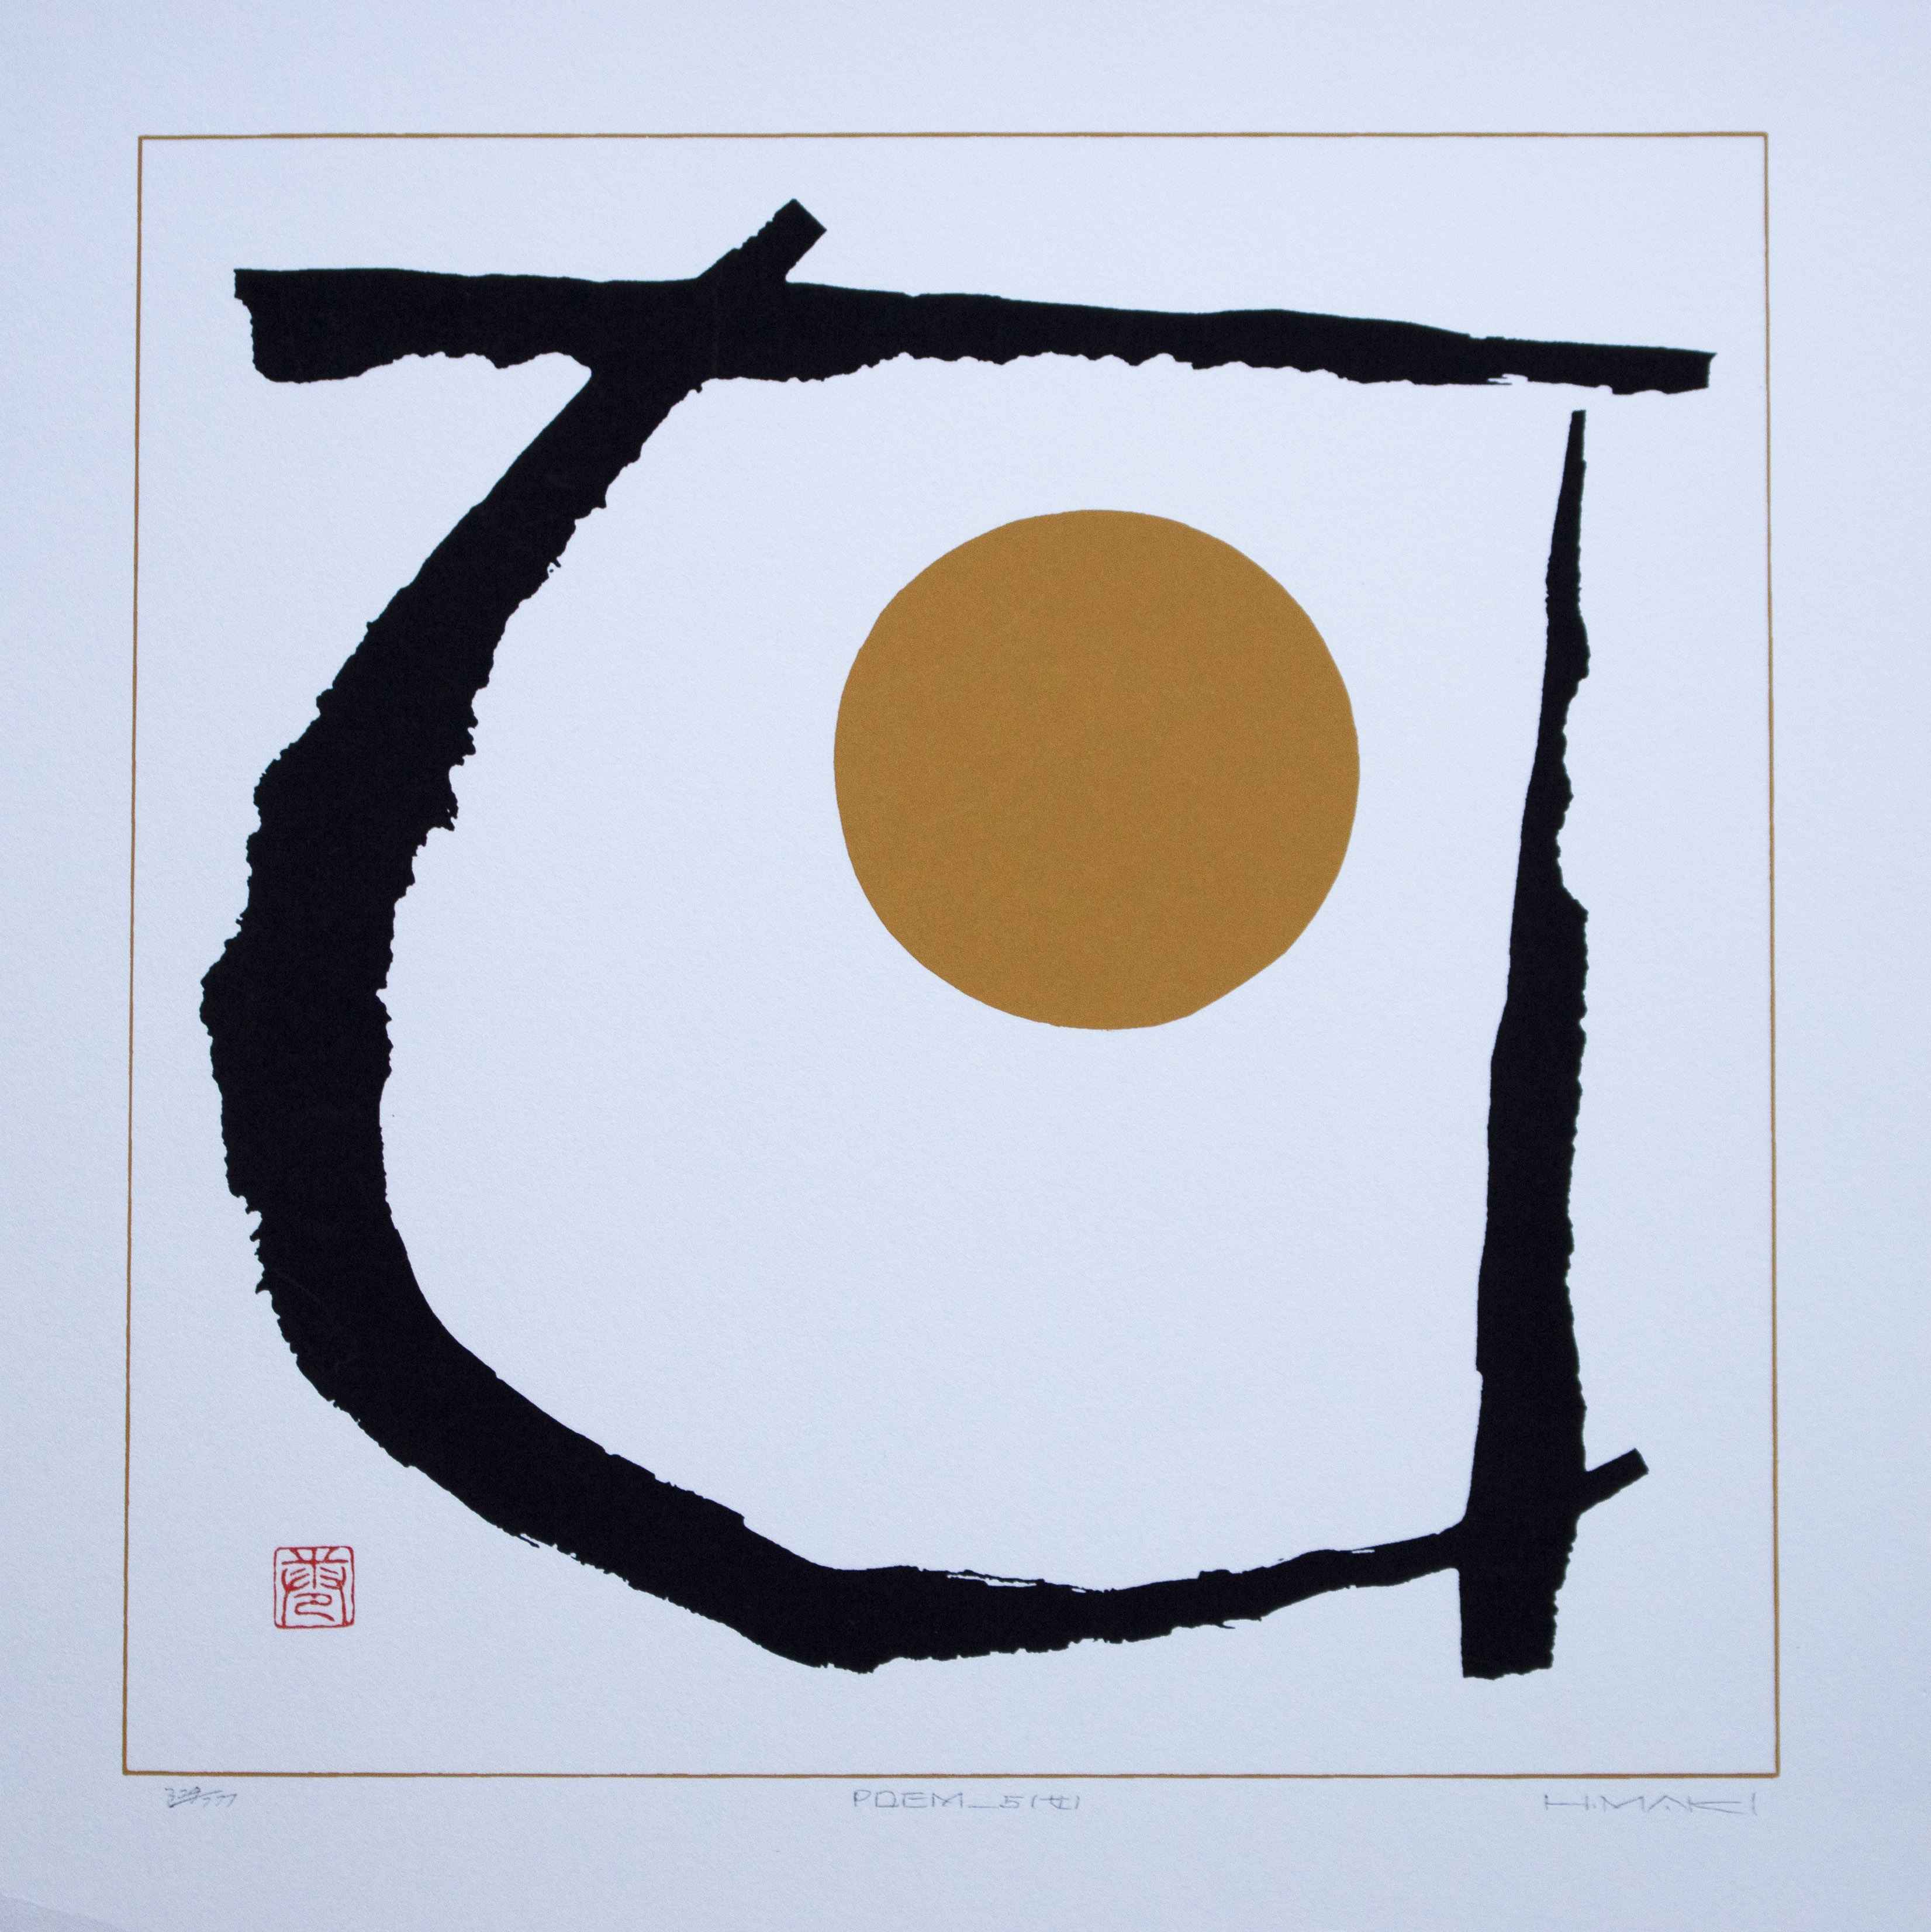 Poem-5 (Woman) by  Haku Maki - Masterpiece Online